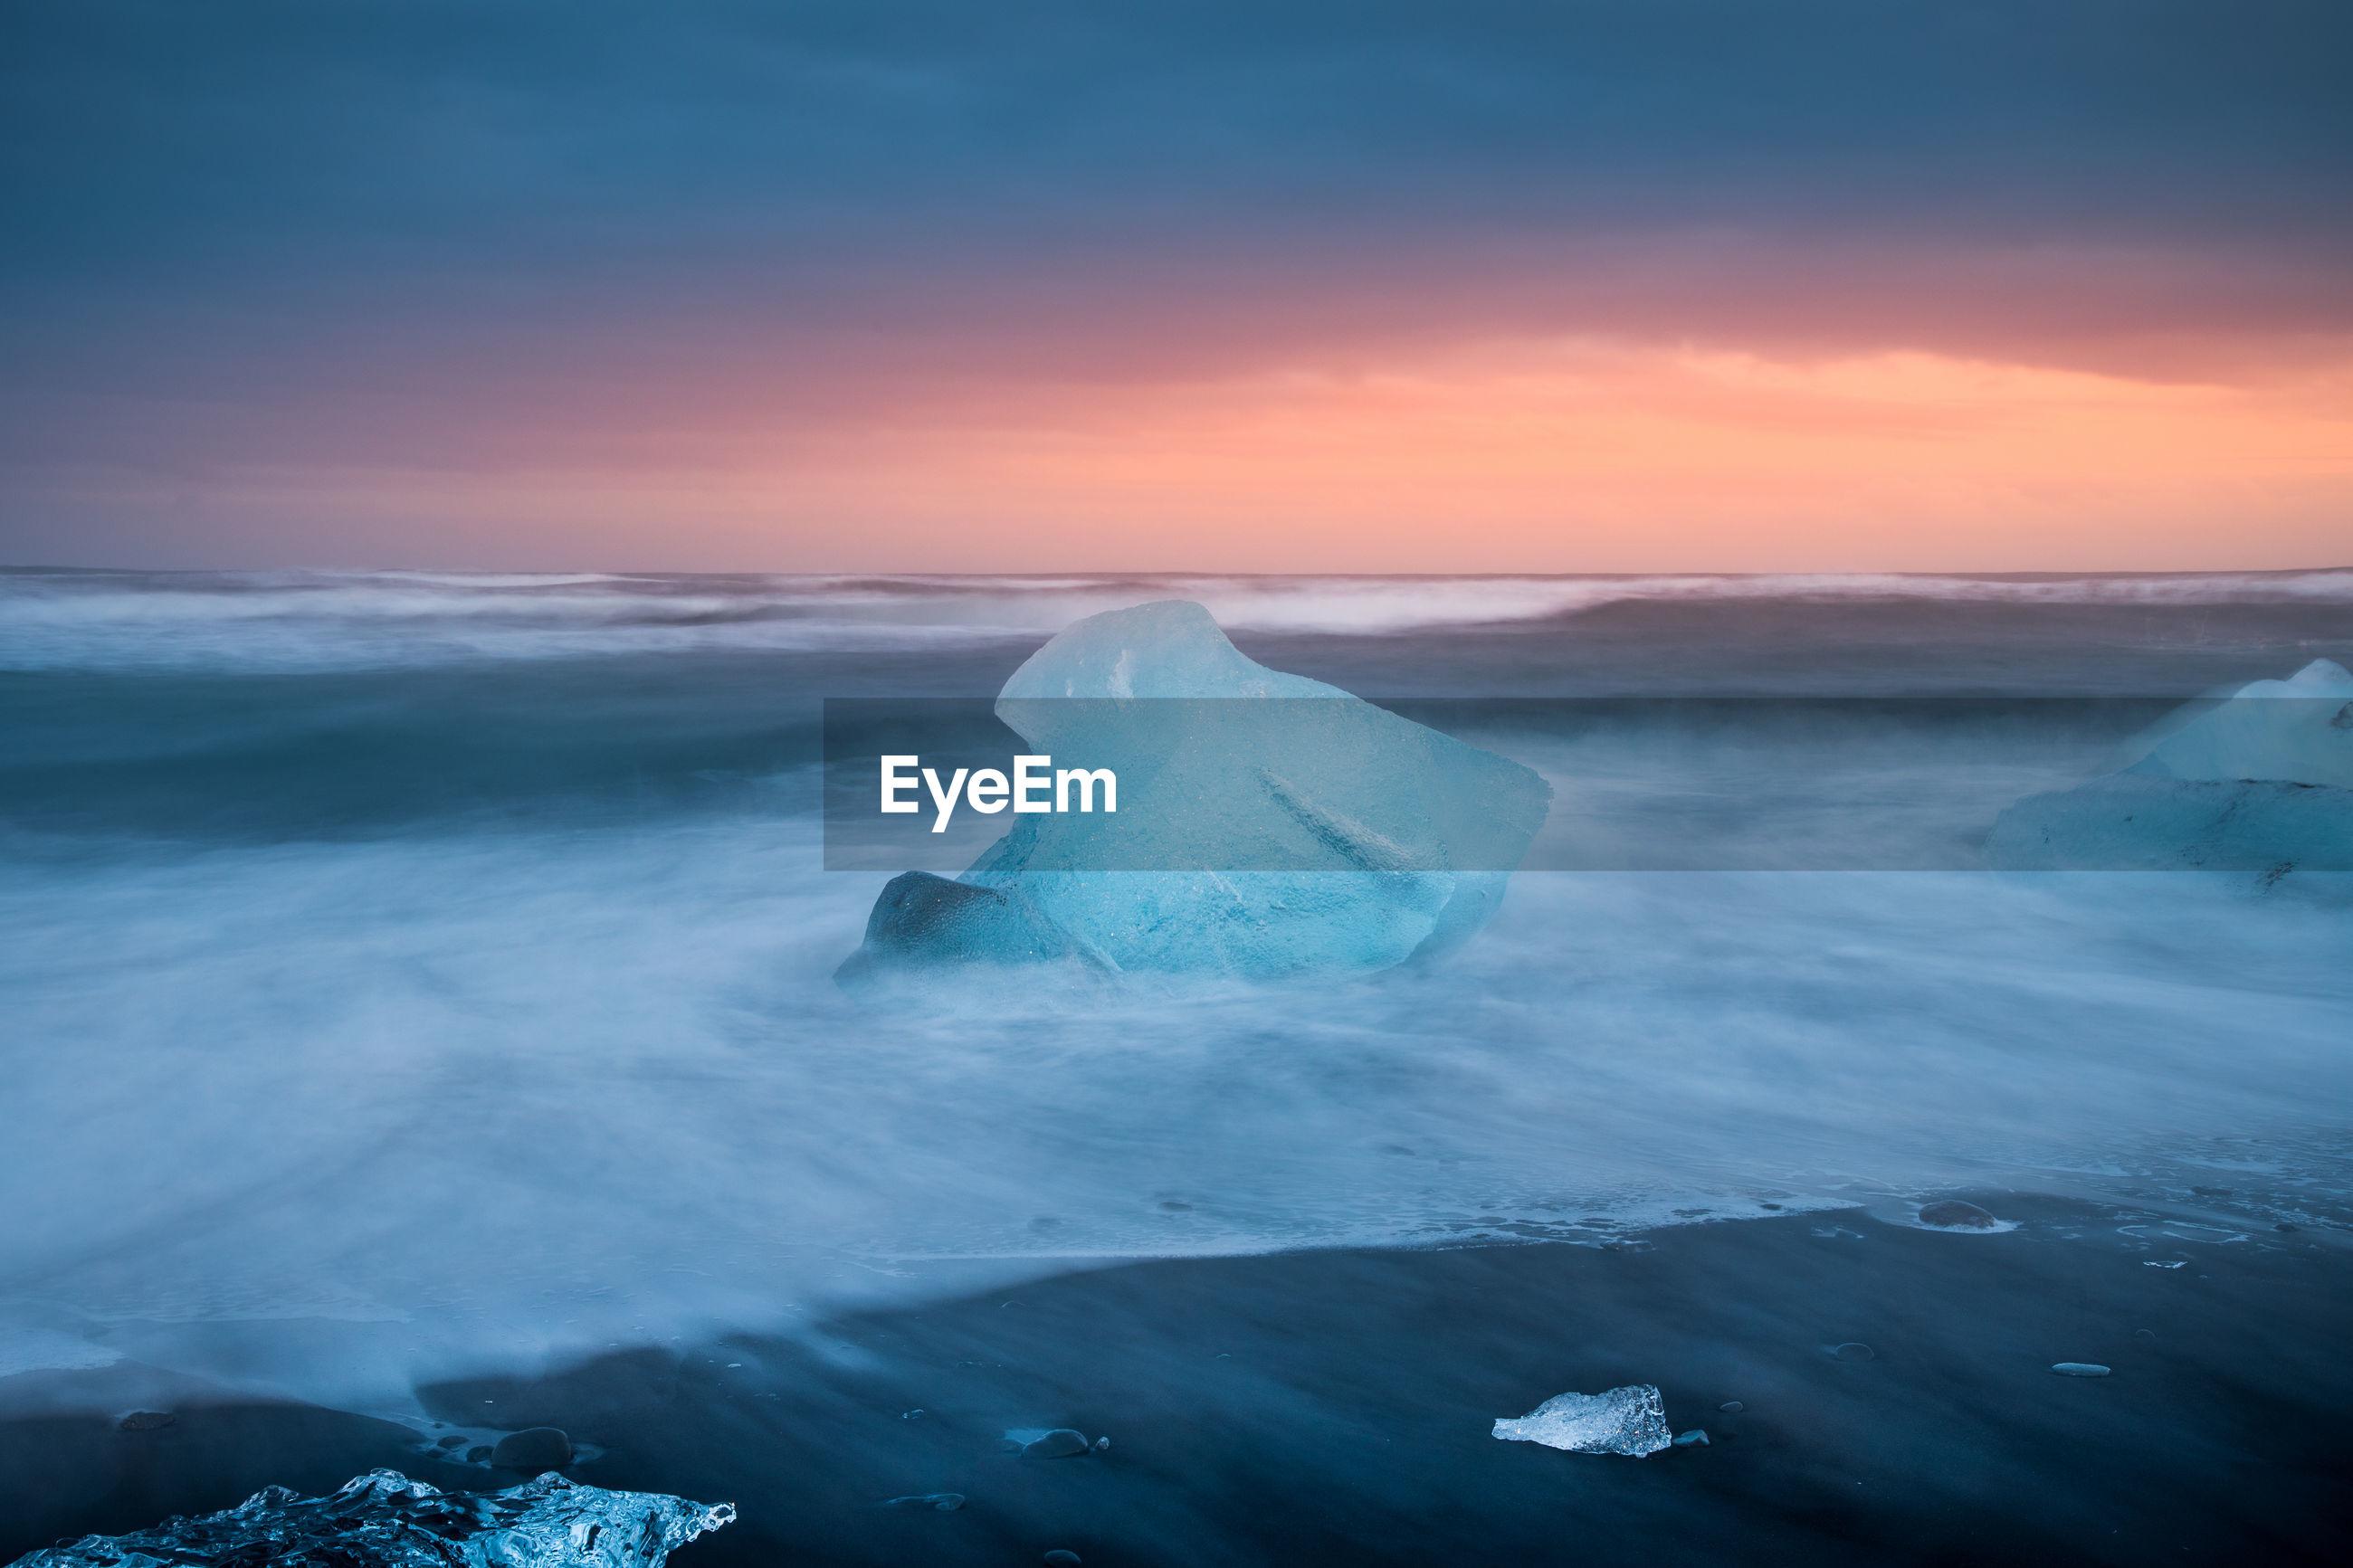 Glacier on shore against cloudy sky